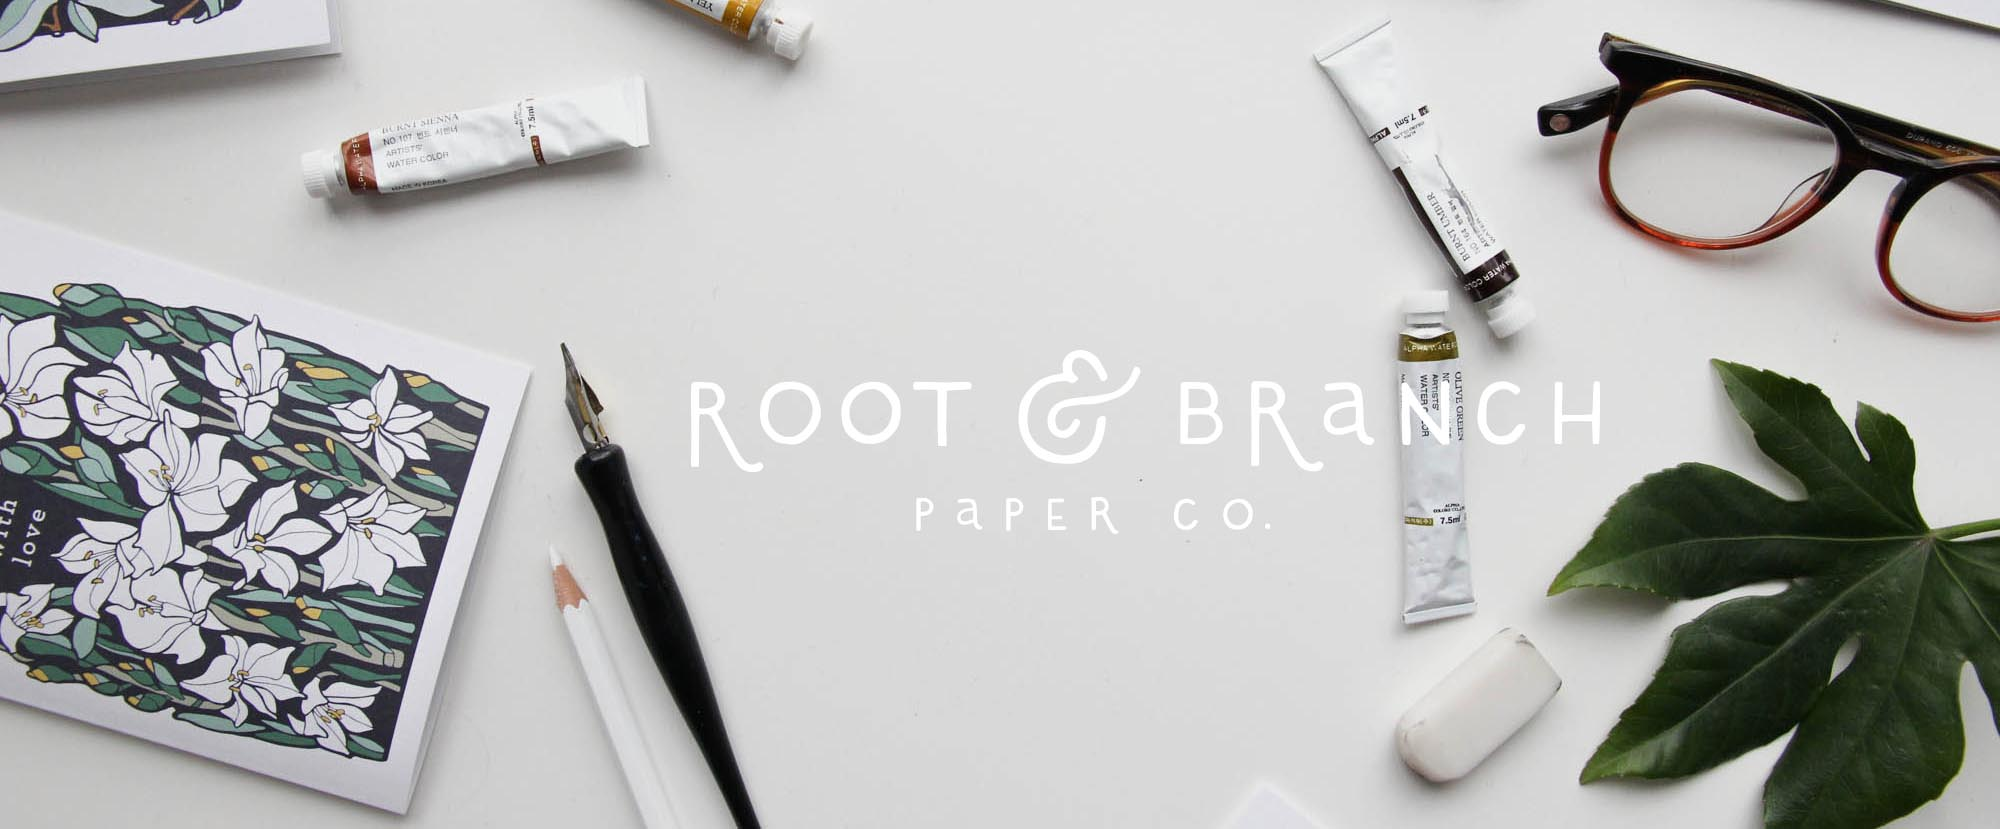 Root&Branch-blog-image-1